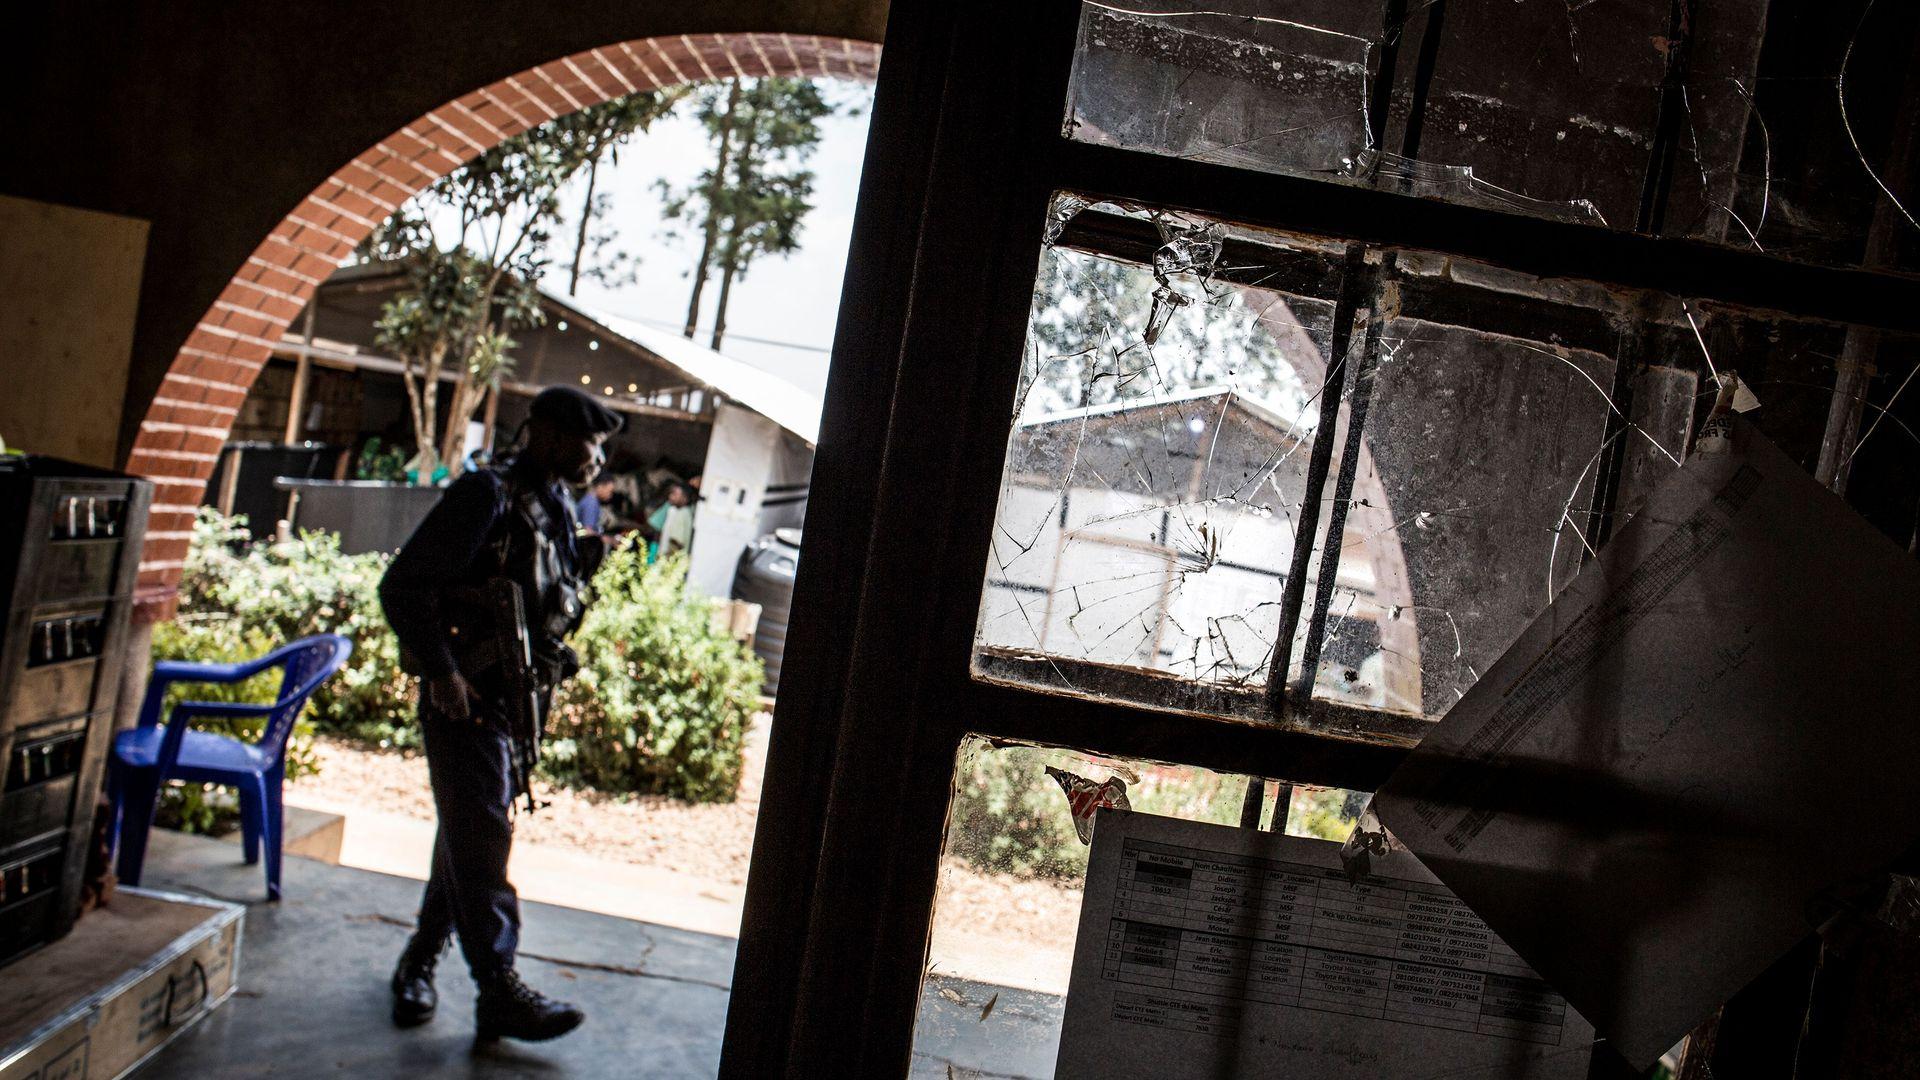 Ebola treatment center in Congo faces first militia attack as fever reaches 1,000 cases